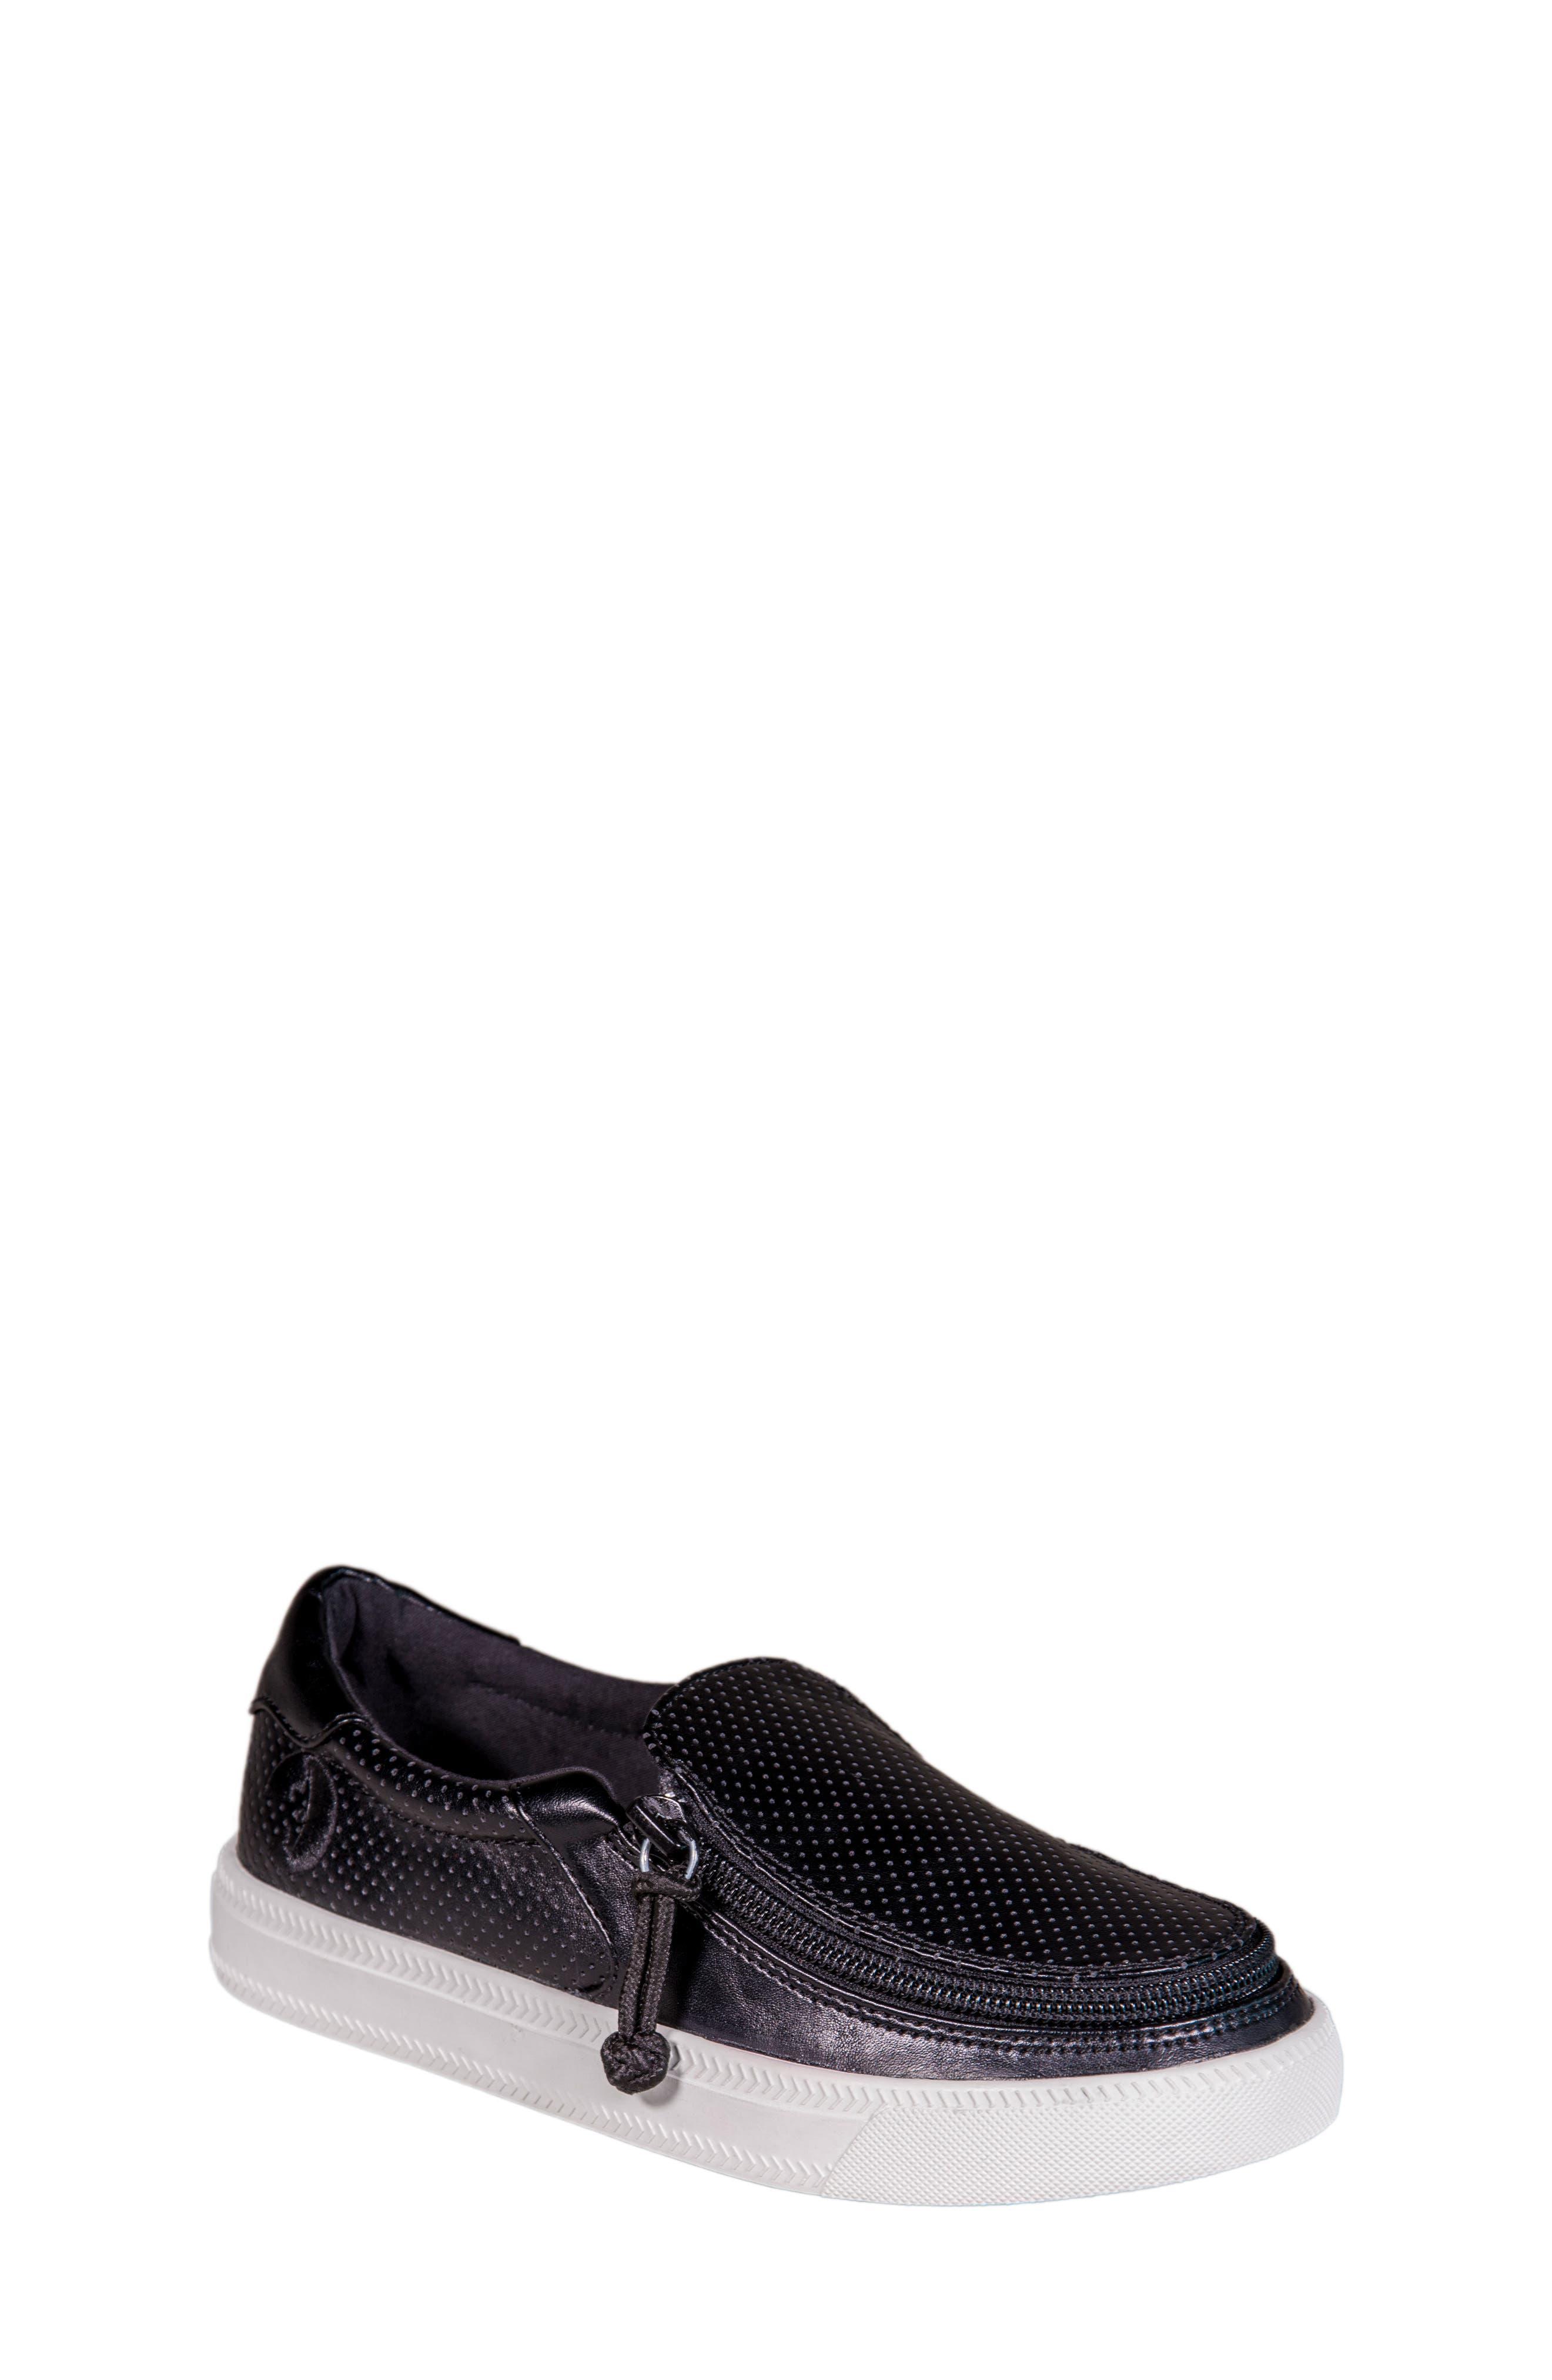 Zip Around Perforated Low Top Sneaker,                             Main thumbnail 1, color,